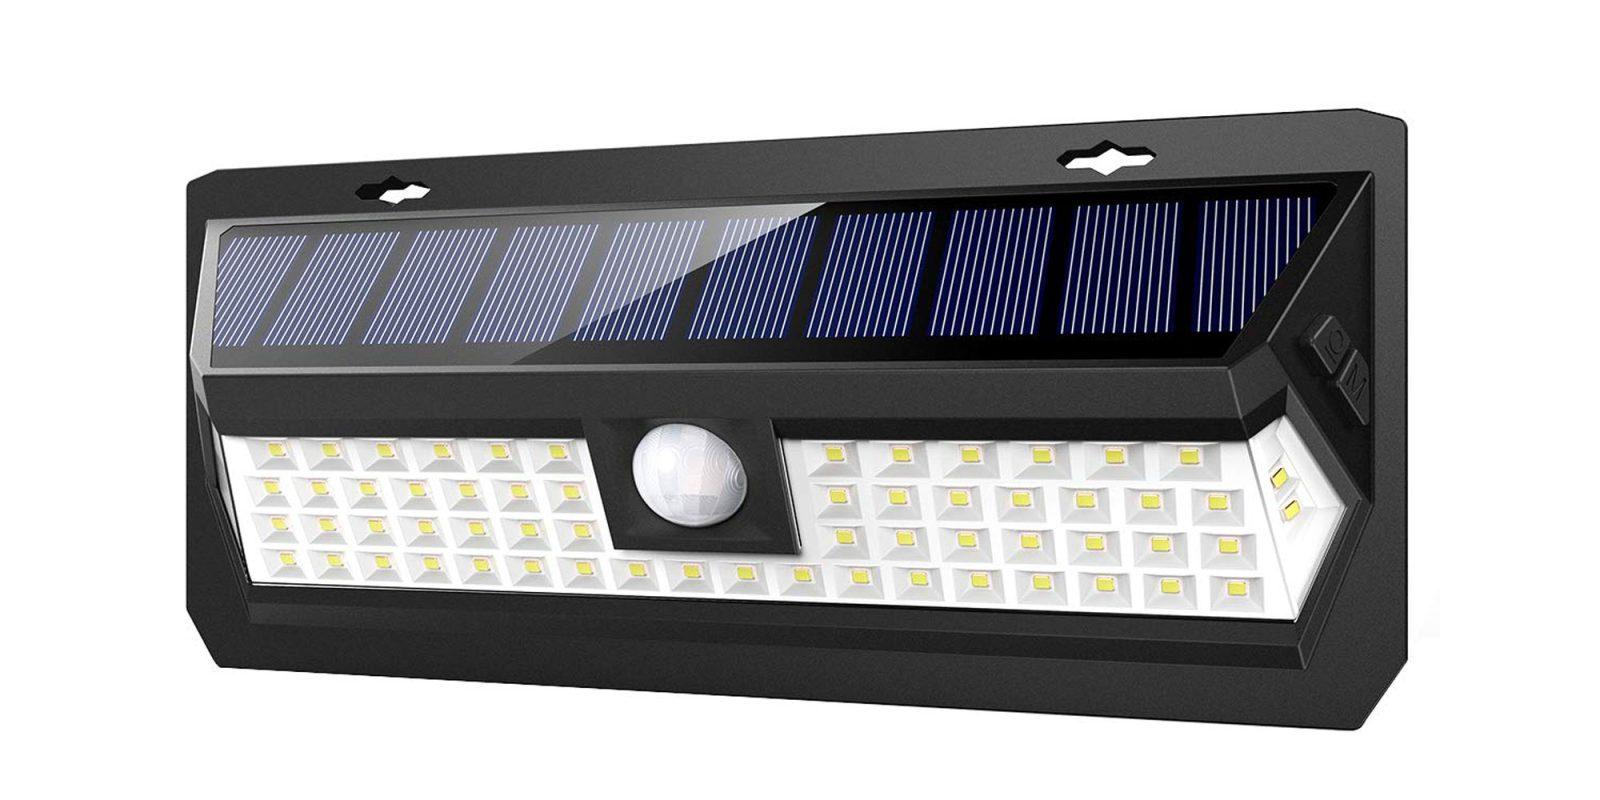 Illuminate backyard parties w/ this 62 LED solar light for $16.50 at Amazon